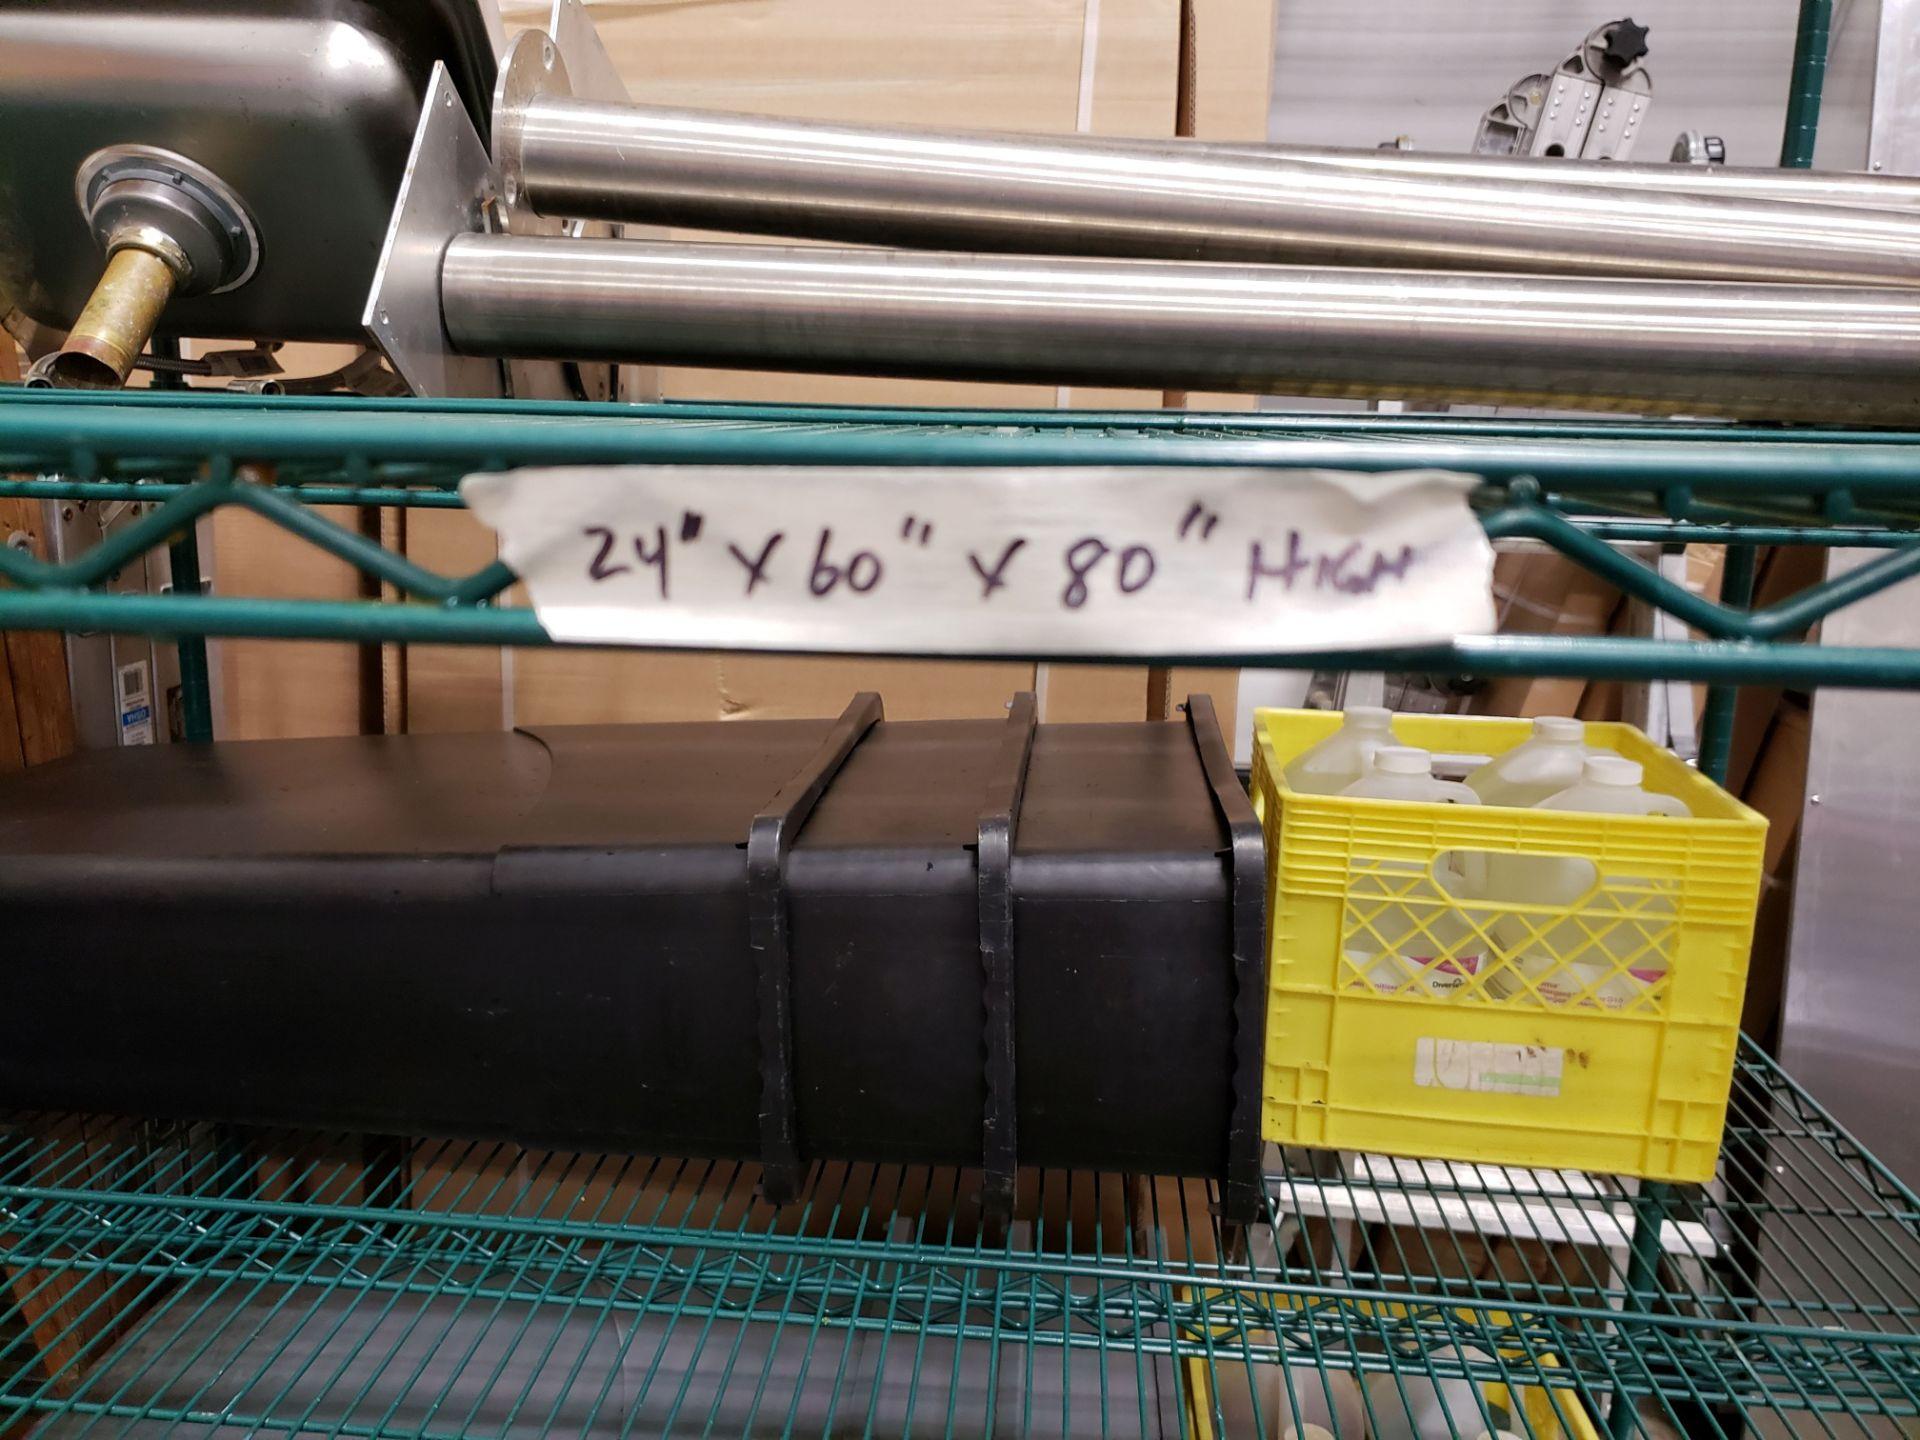 "Lot 10 - 24"" x 60"" x 80"" High Green Epoxy 4 Shelf Rack on Casters"